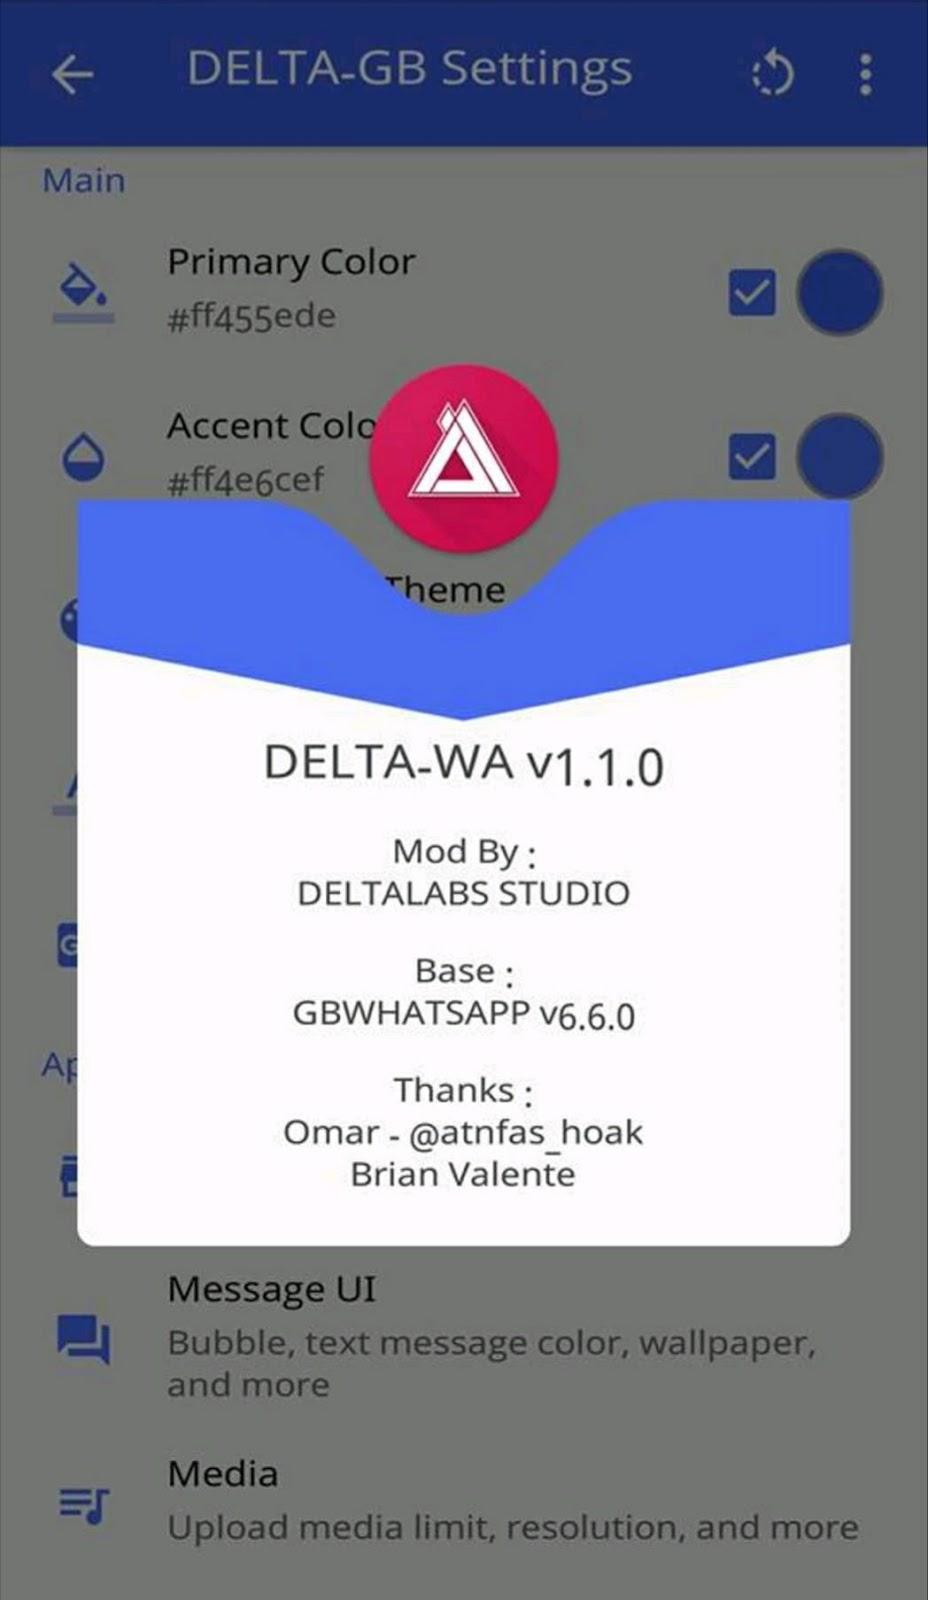 Download Whatsapp Mod Delta-GB versi 1.1.0 by bung yoyok 5